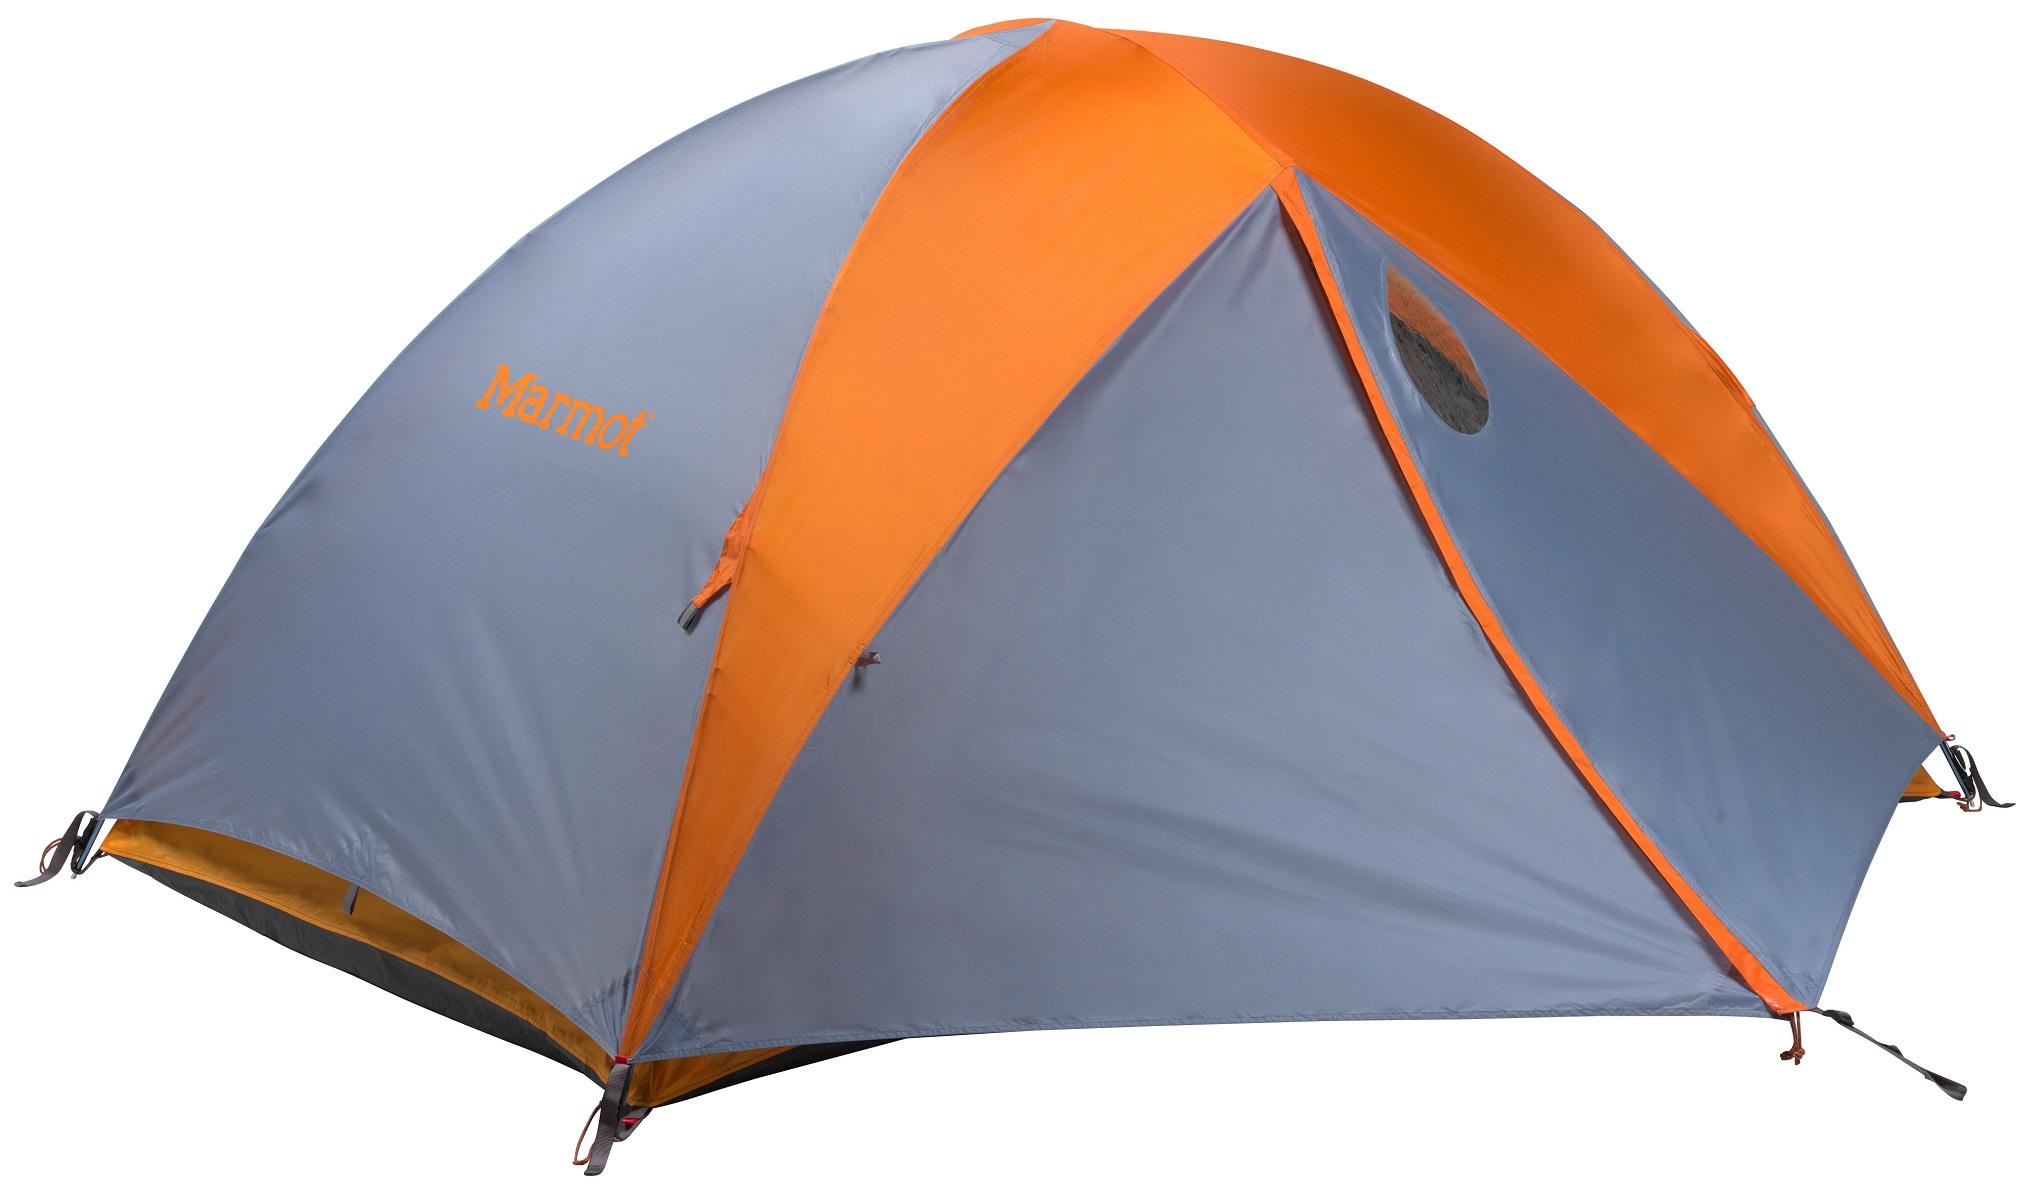 Палатка Marmot Limelight 2P, цвет: оранжевый